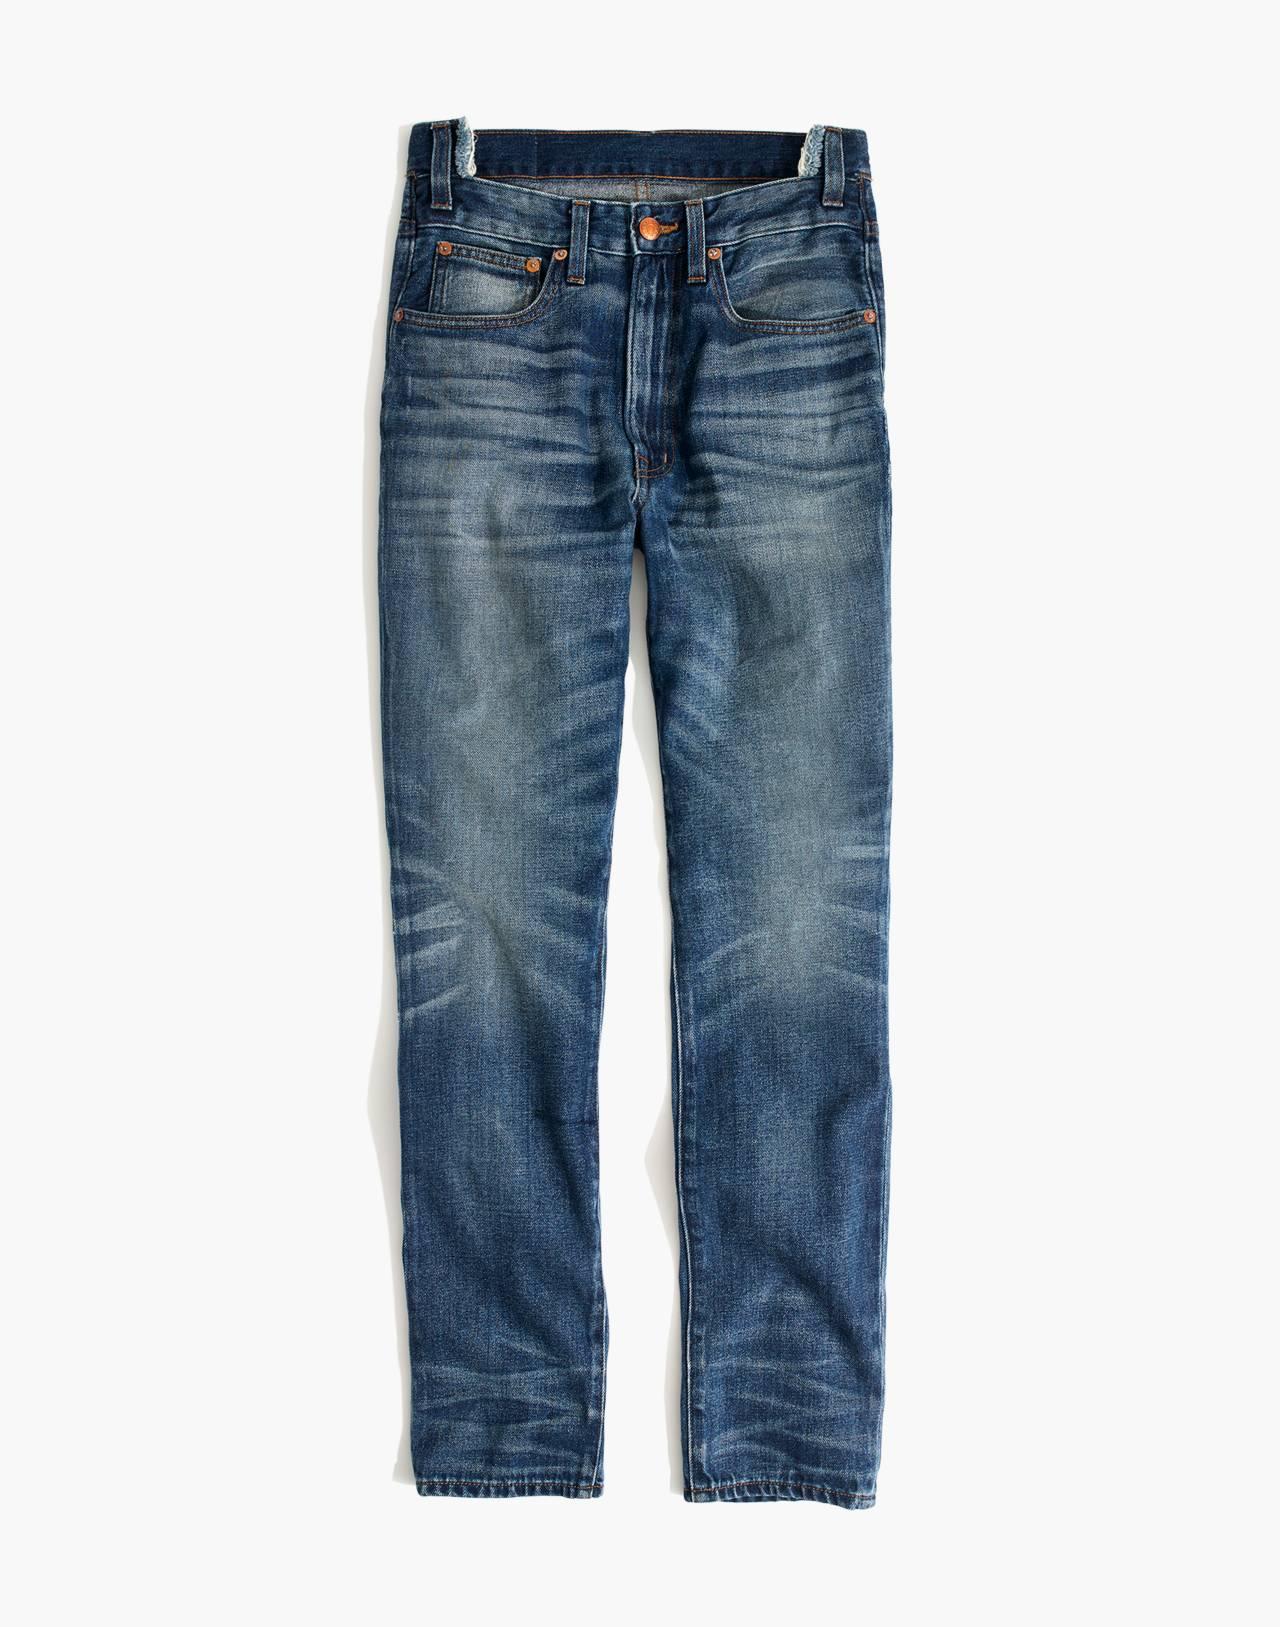 Rivet & Thread Rigid Skinny Jeans: Step-Waist Edition in martinez image 4